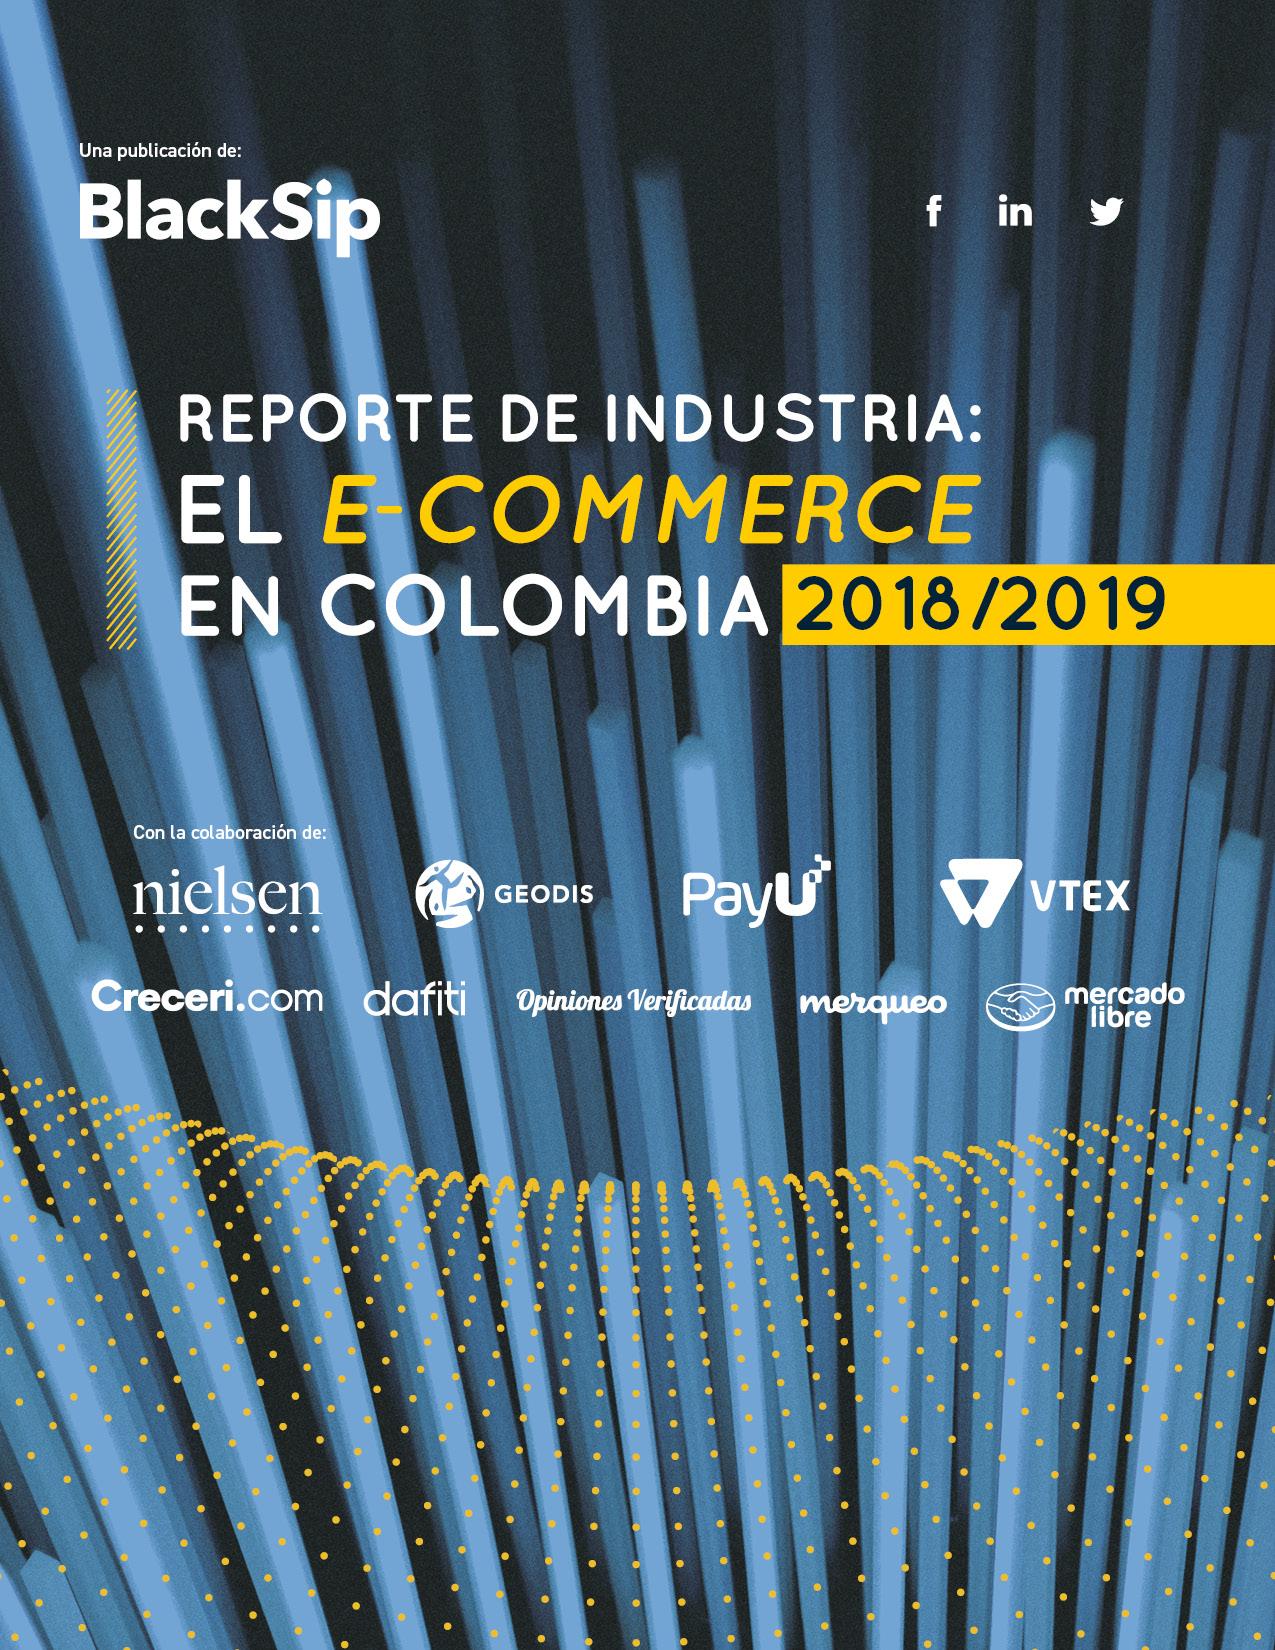 portada de ebook Reporte de Industria 2018